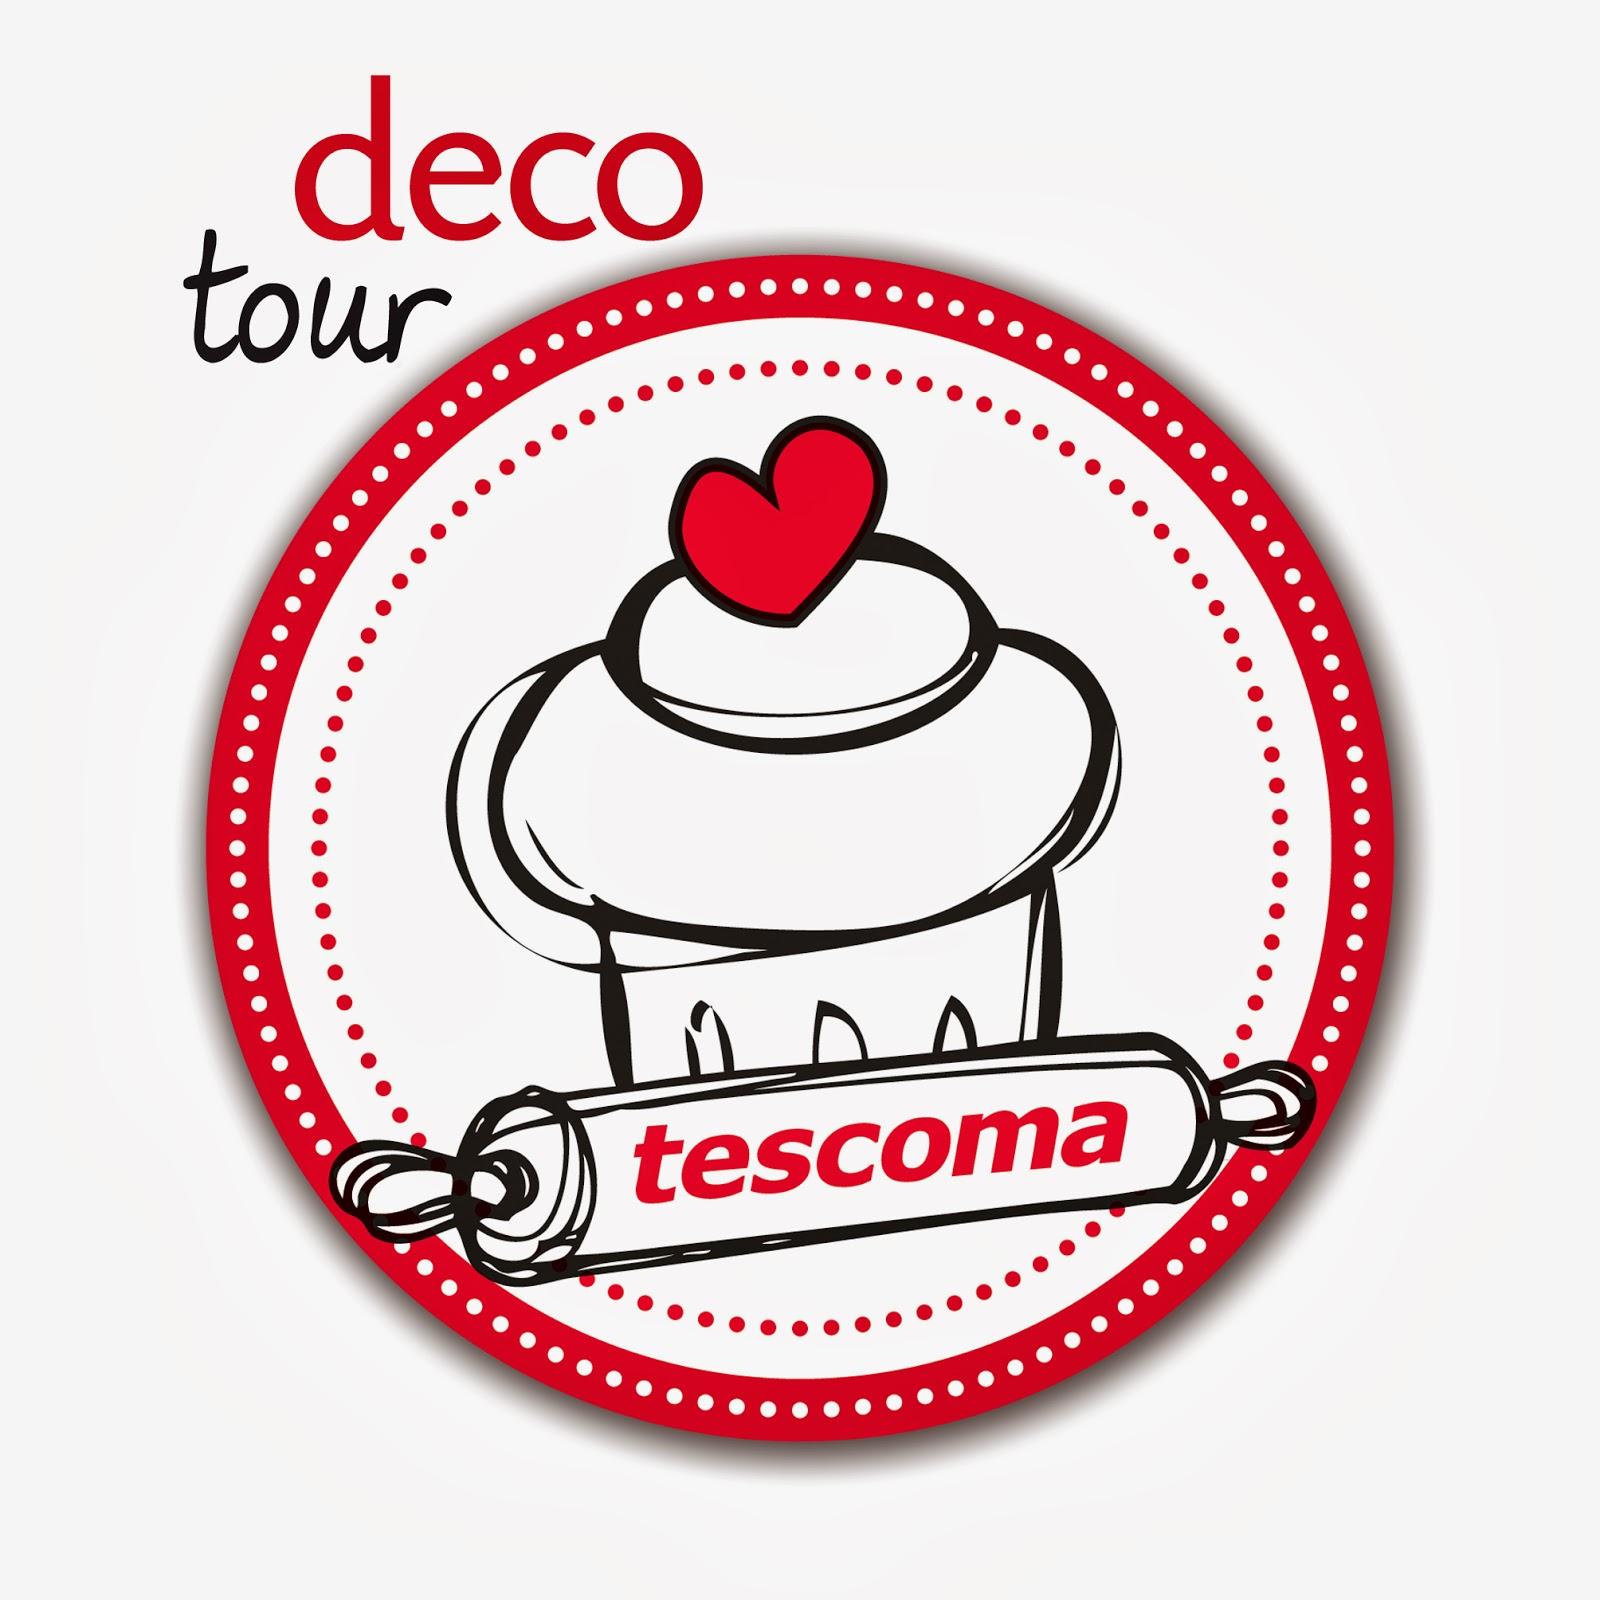 tescoma deco tour cake design polvere di zucchero